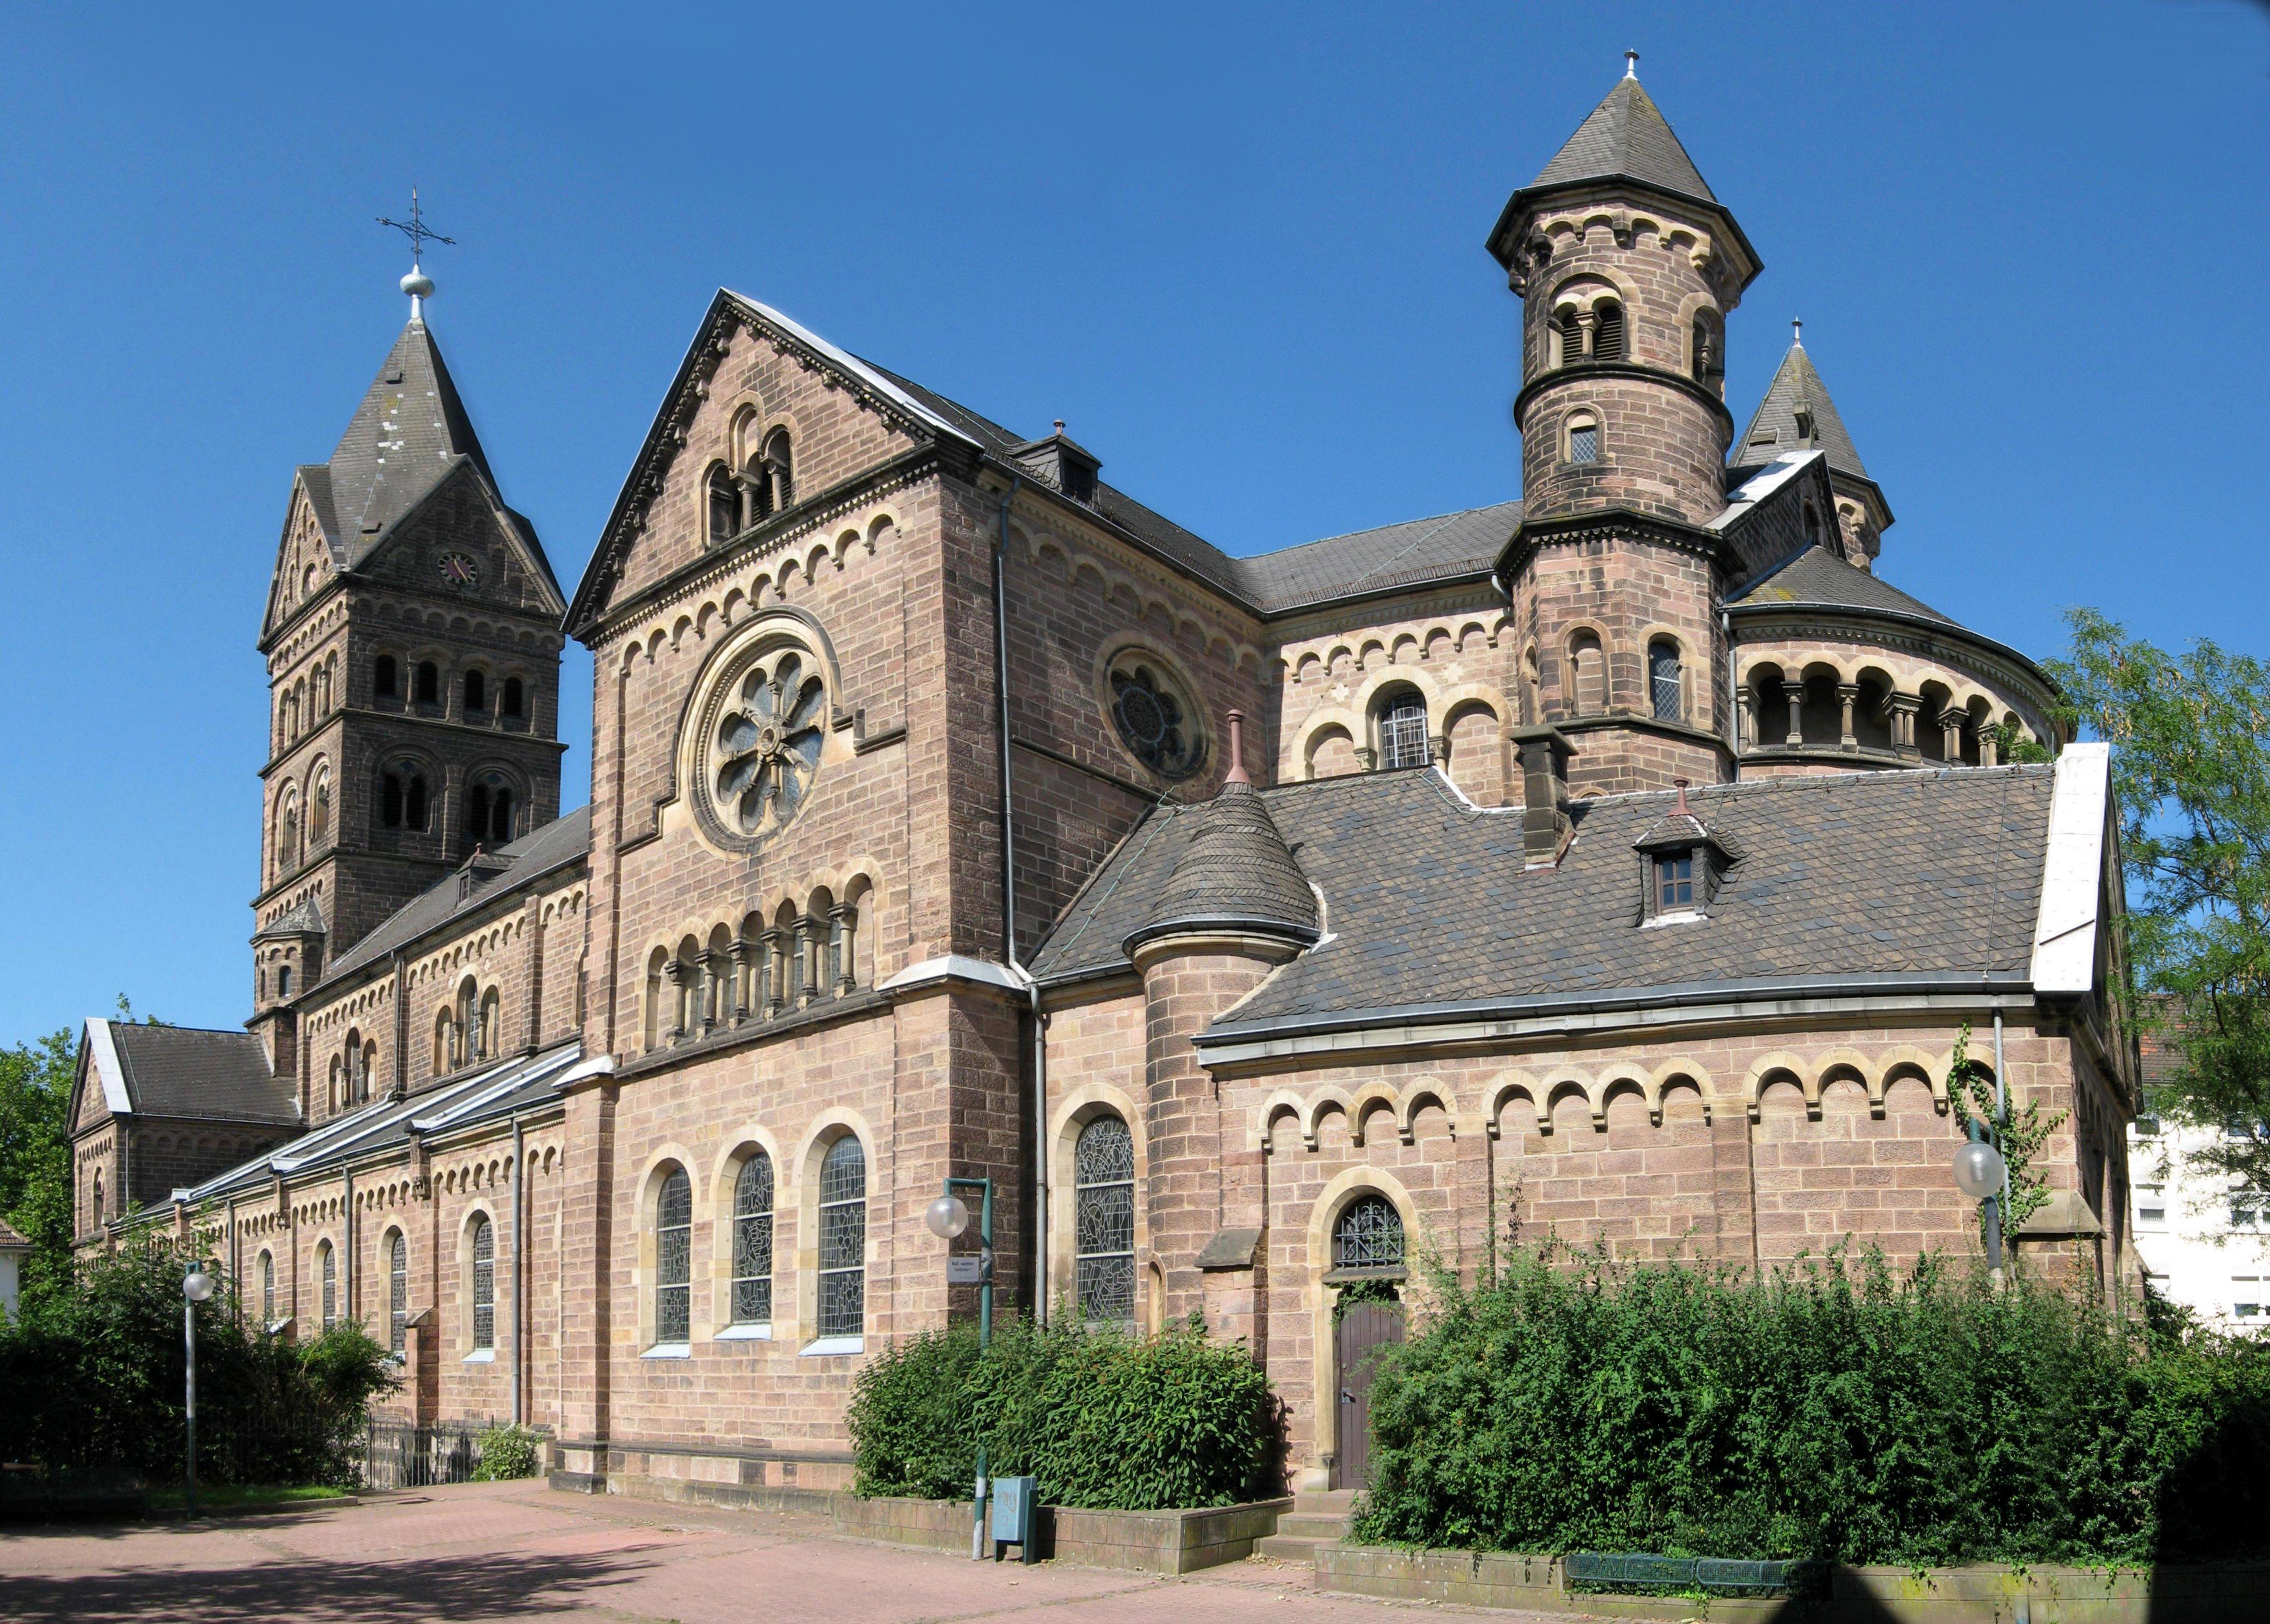 File:Neunkirchen Saar StMaria.jpg - Wikimedia Commons